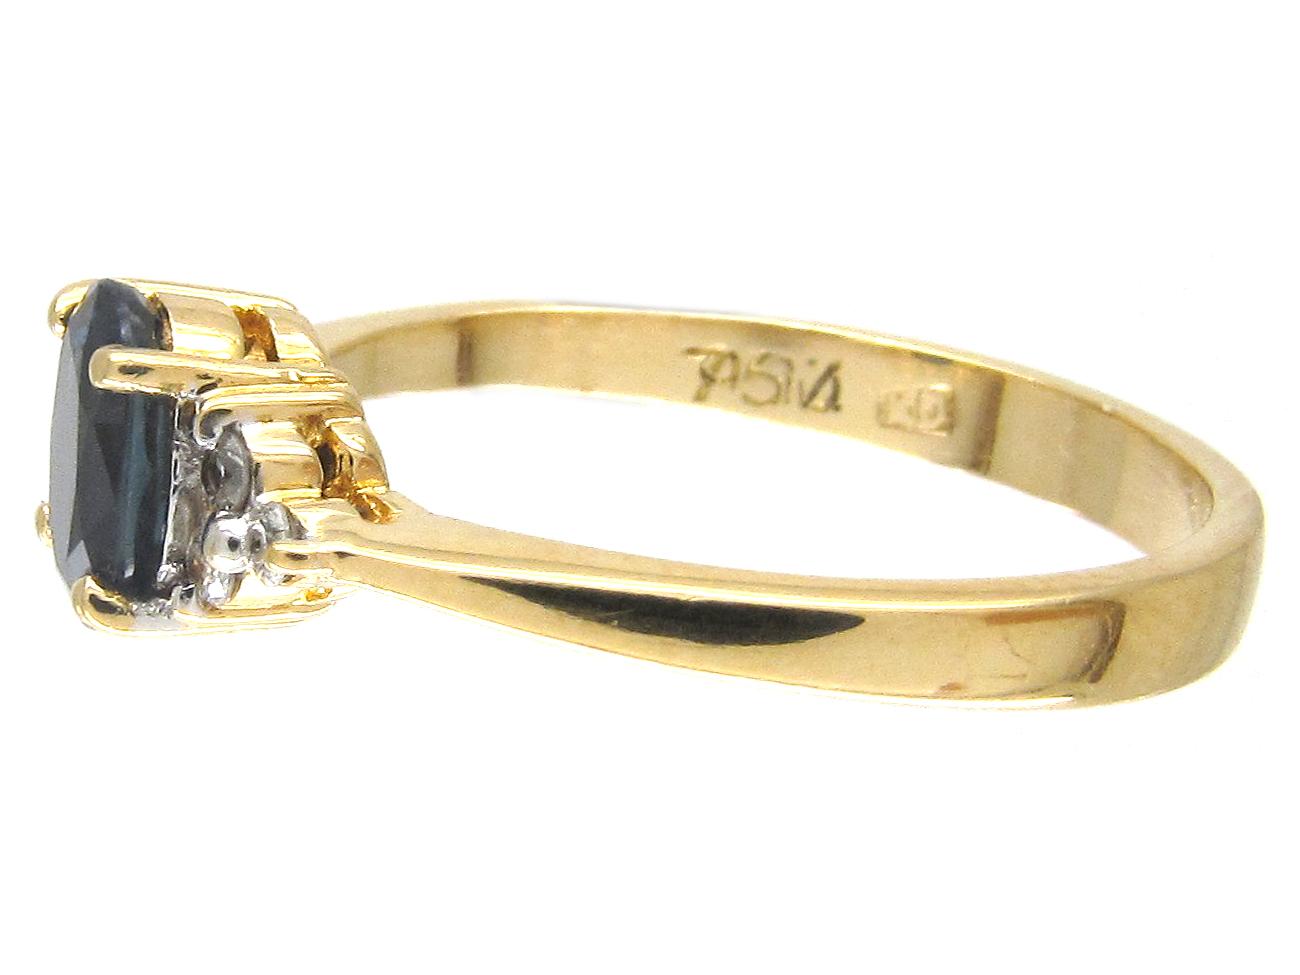 solitaire sapphire diamond shoulders ring the antique. Black Bedroom Furniture Sets. Home Design Ideas